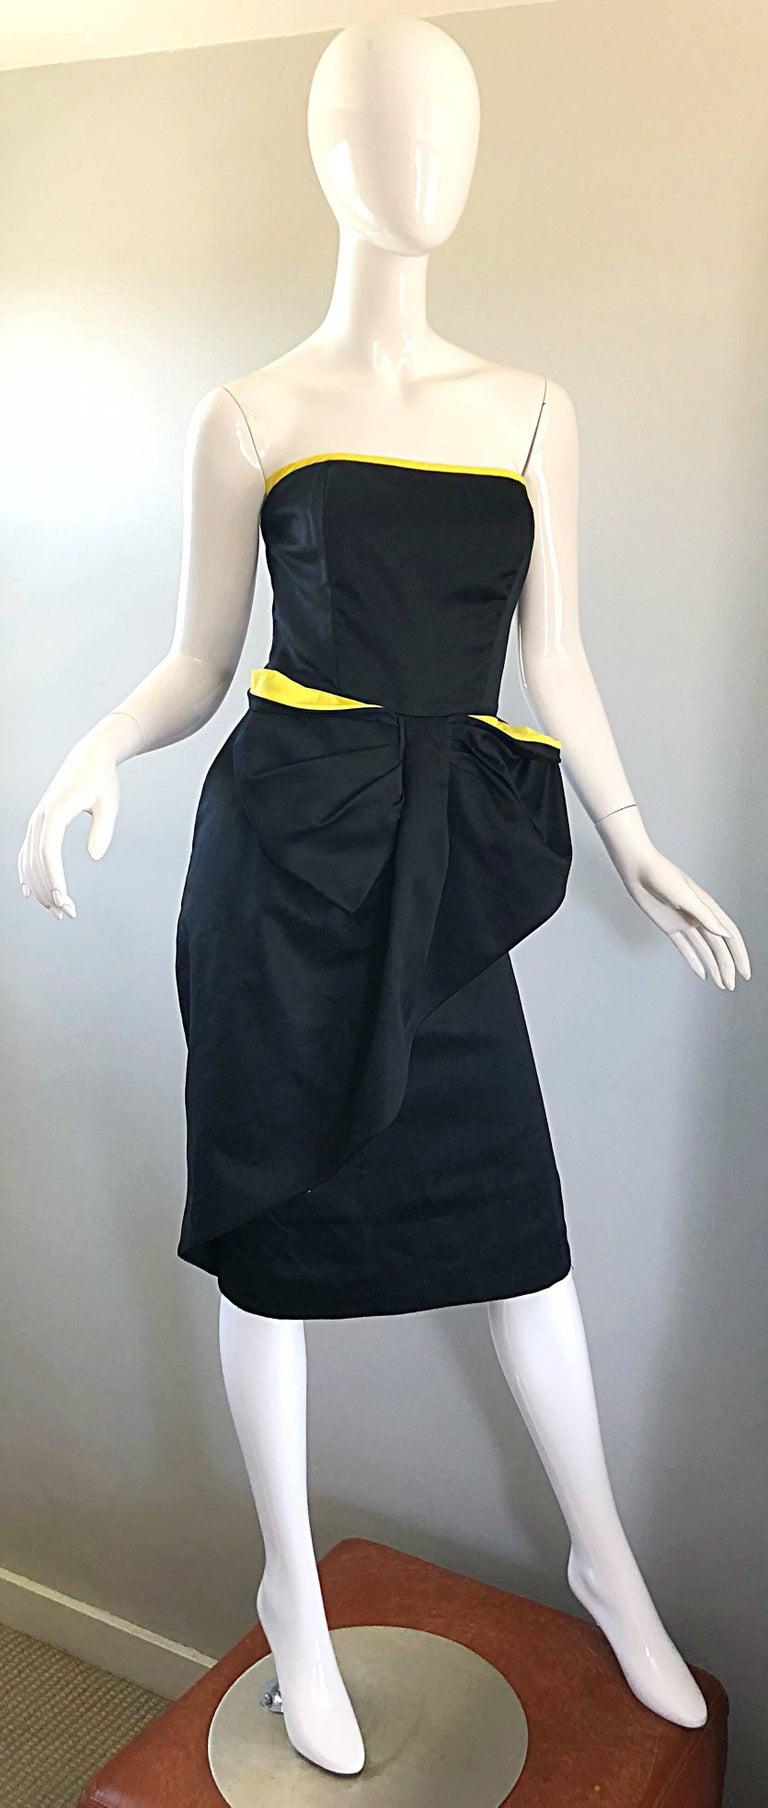 Vintage VIctor Costa Black + Yellow Avant Garde 1980s Strapless Cotton Dress For Sale 1